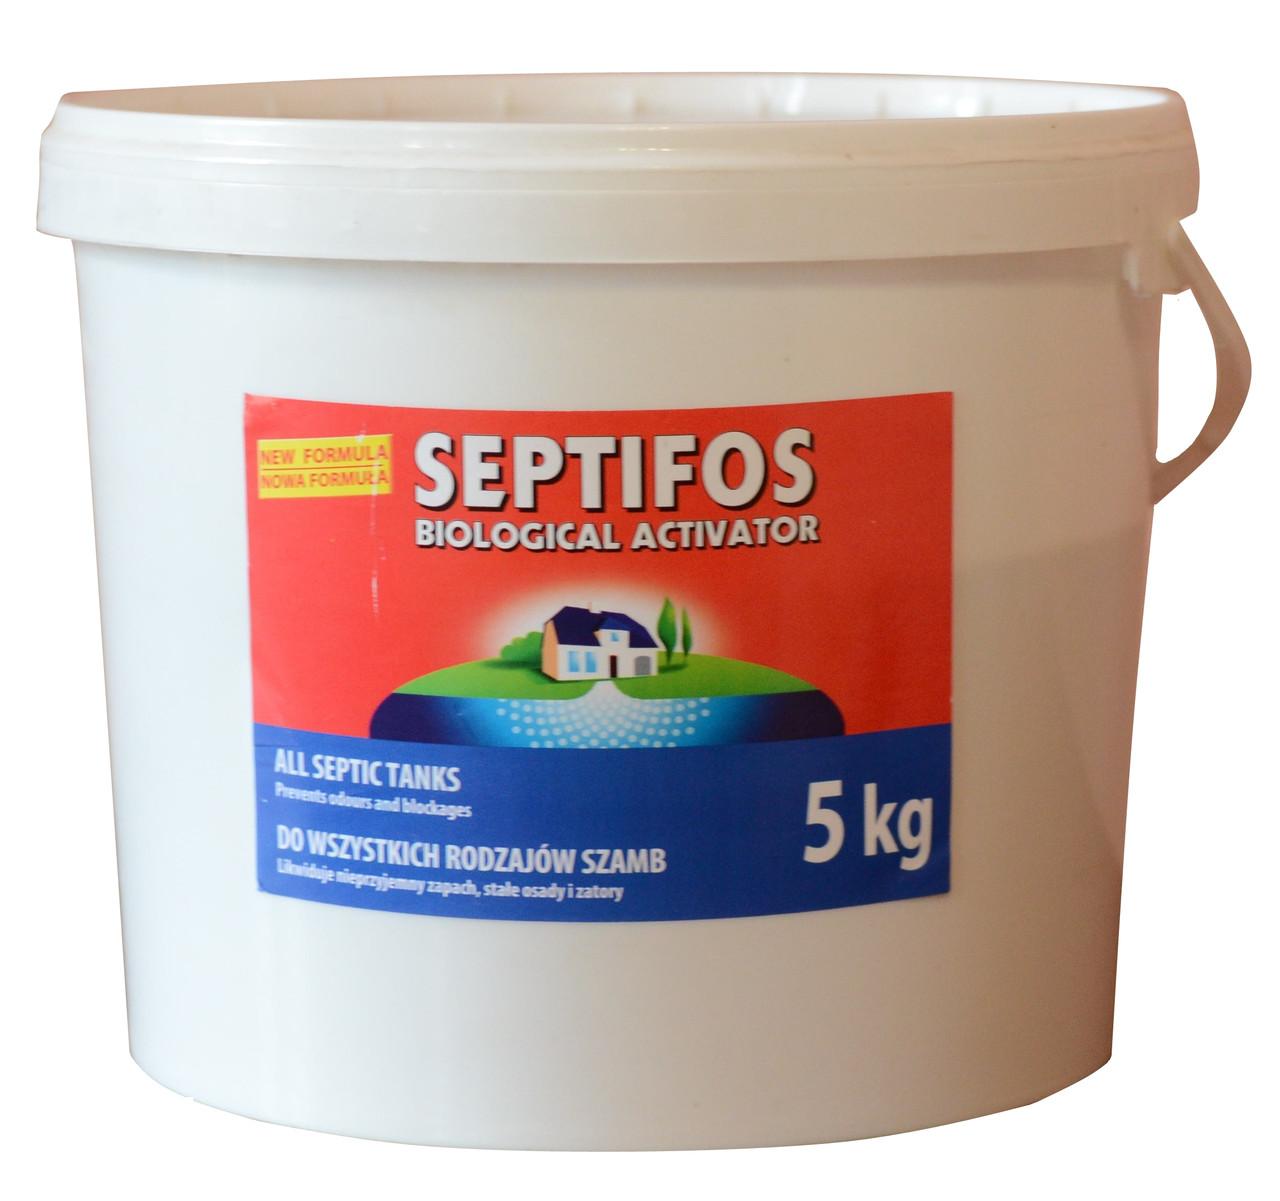 Бактерія для вигрібних ям SEPTIFOS biologocal activator 5 кг